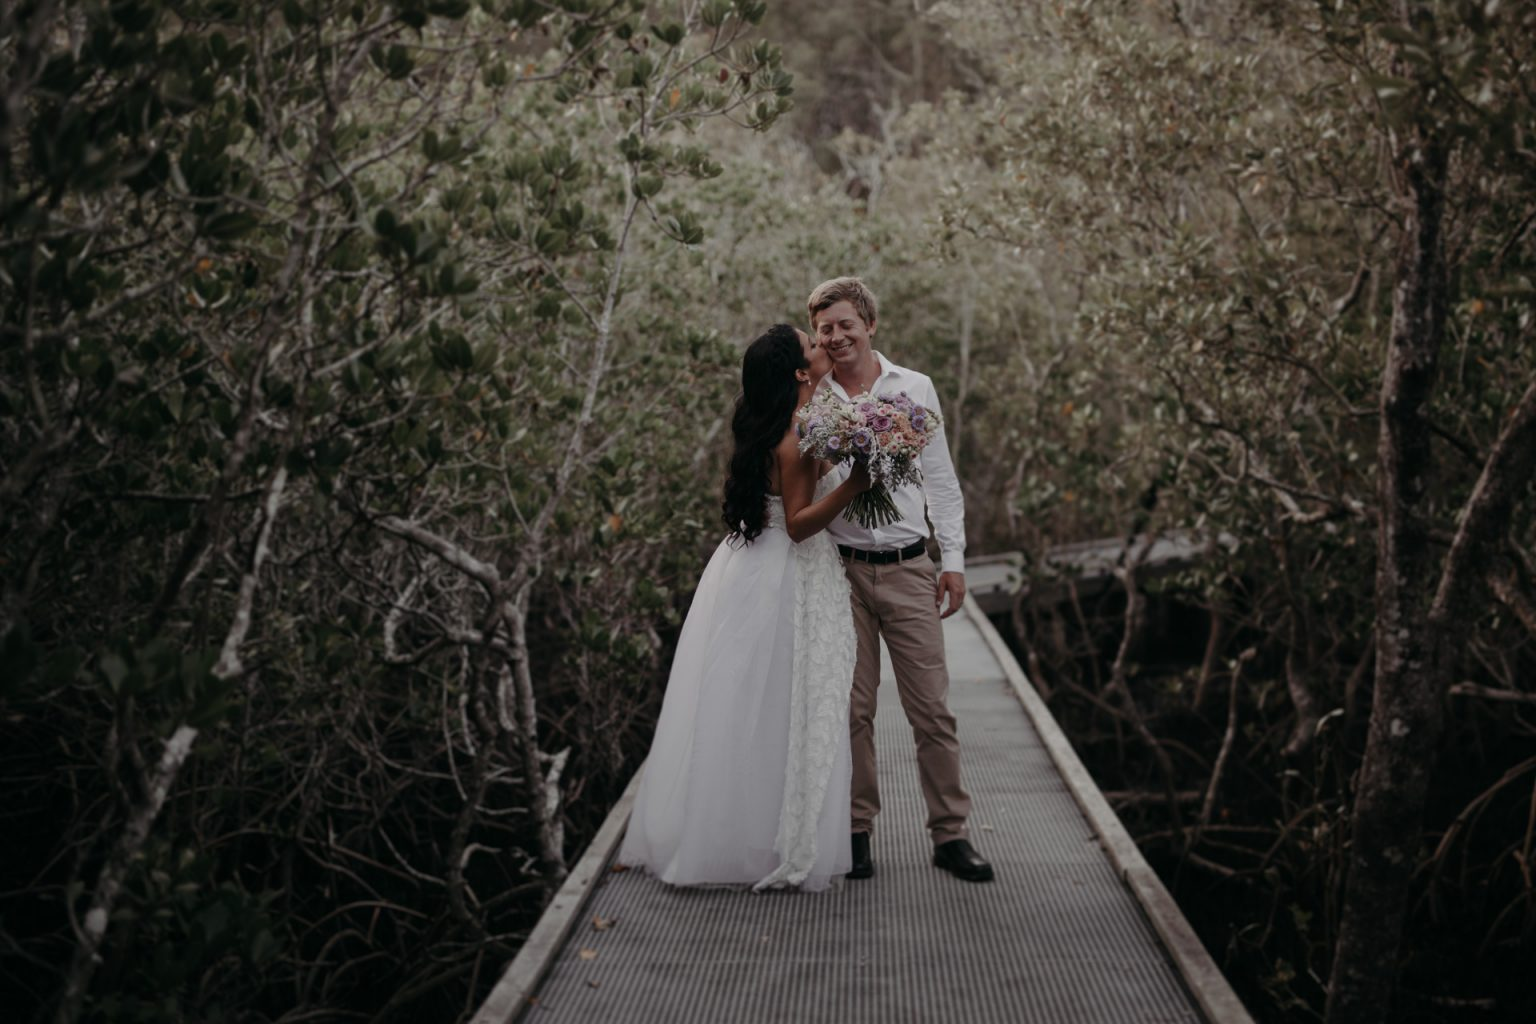 bride and groom walking through forest burleigh headland boardwalk